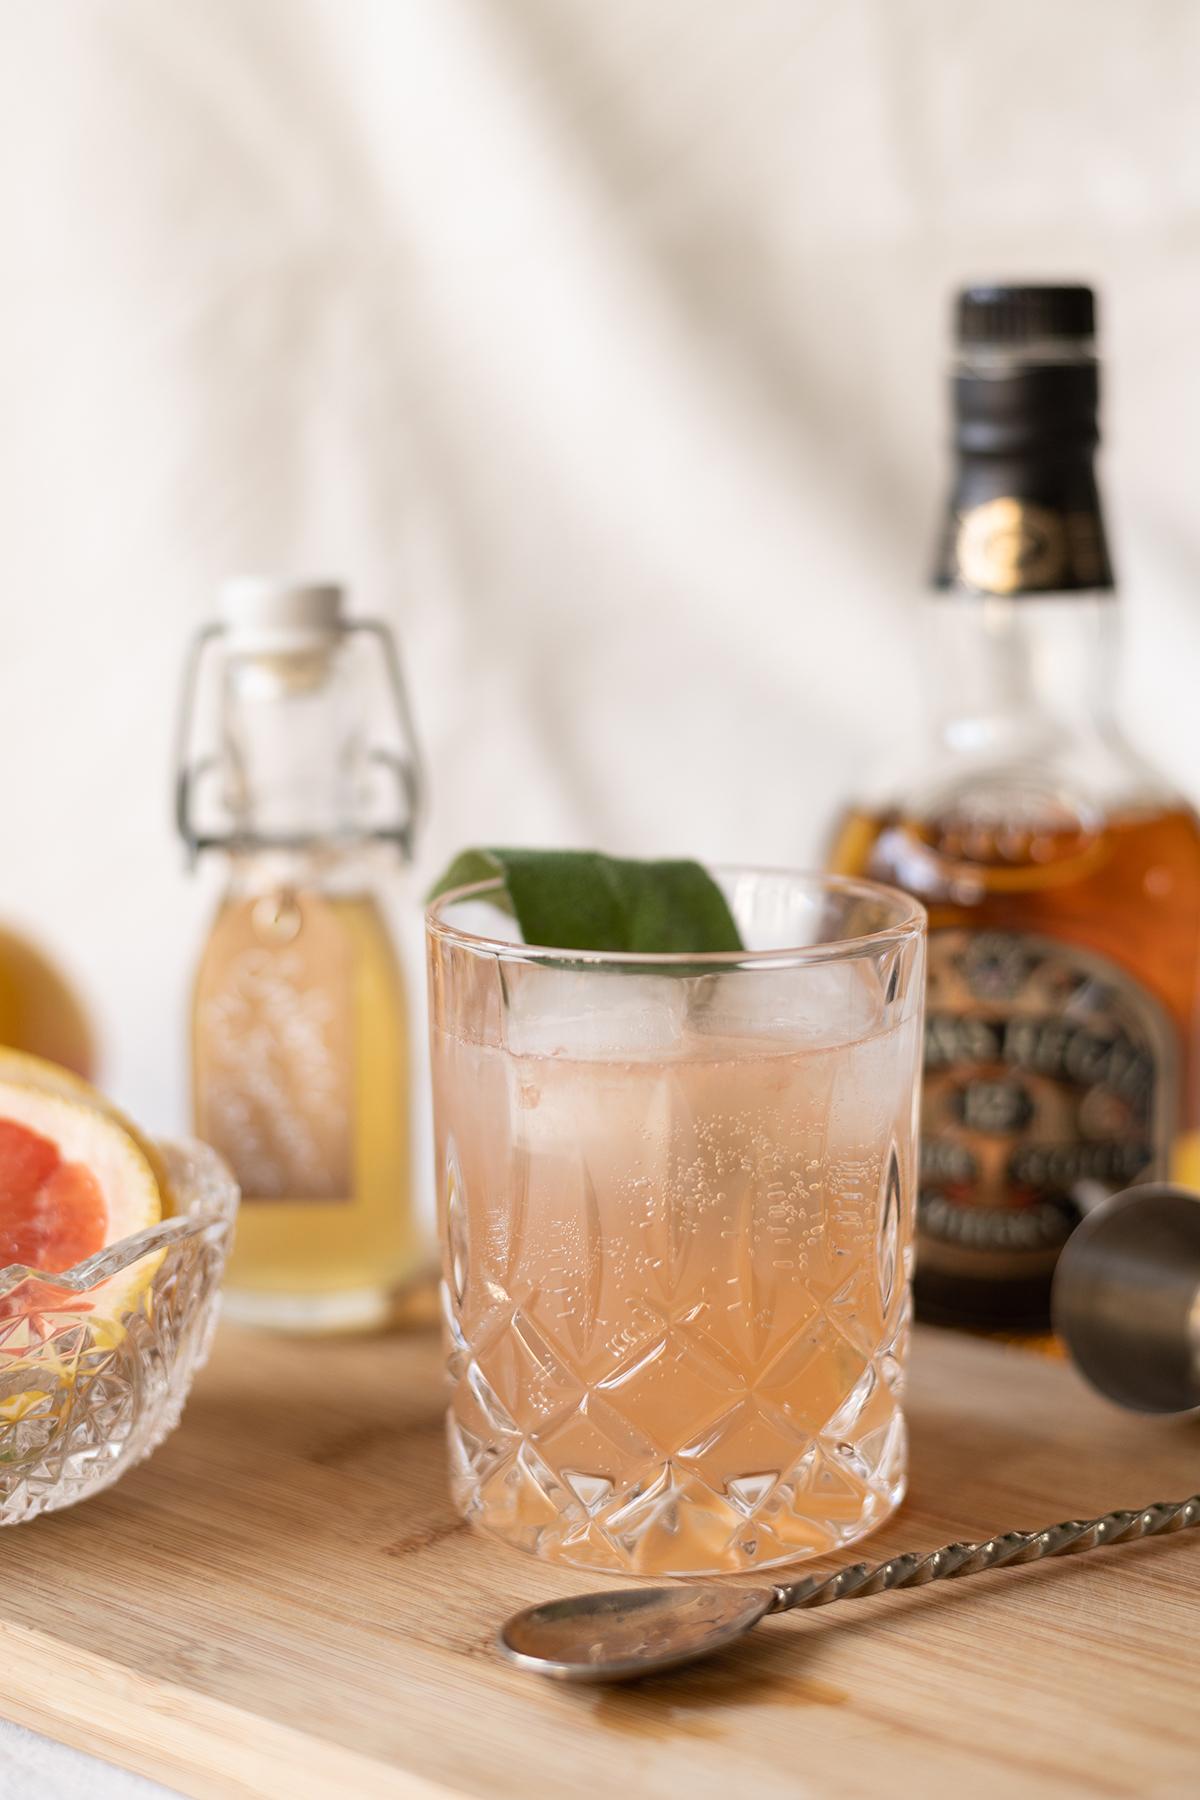 Drink: Grapefruit Whiskey Sour | we love handmade